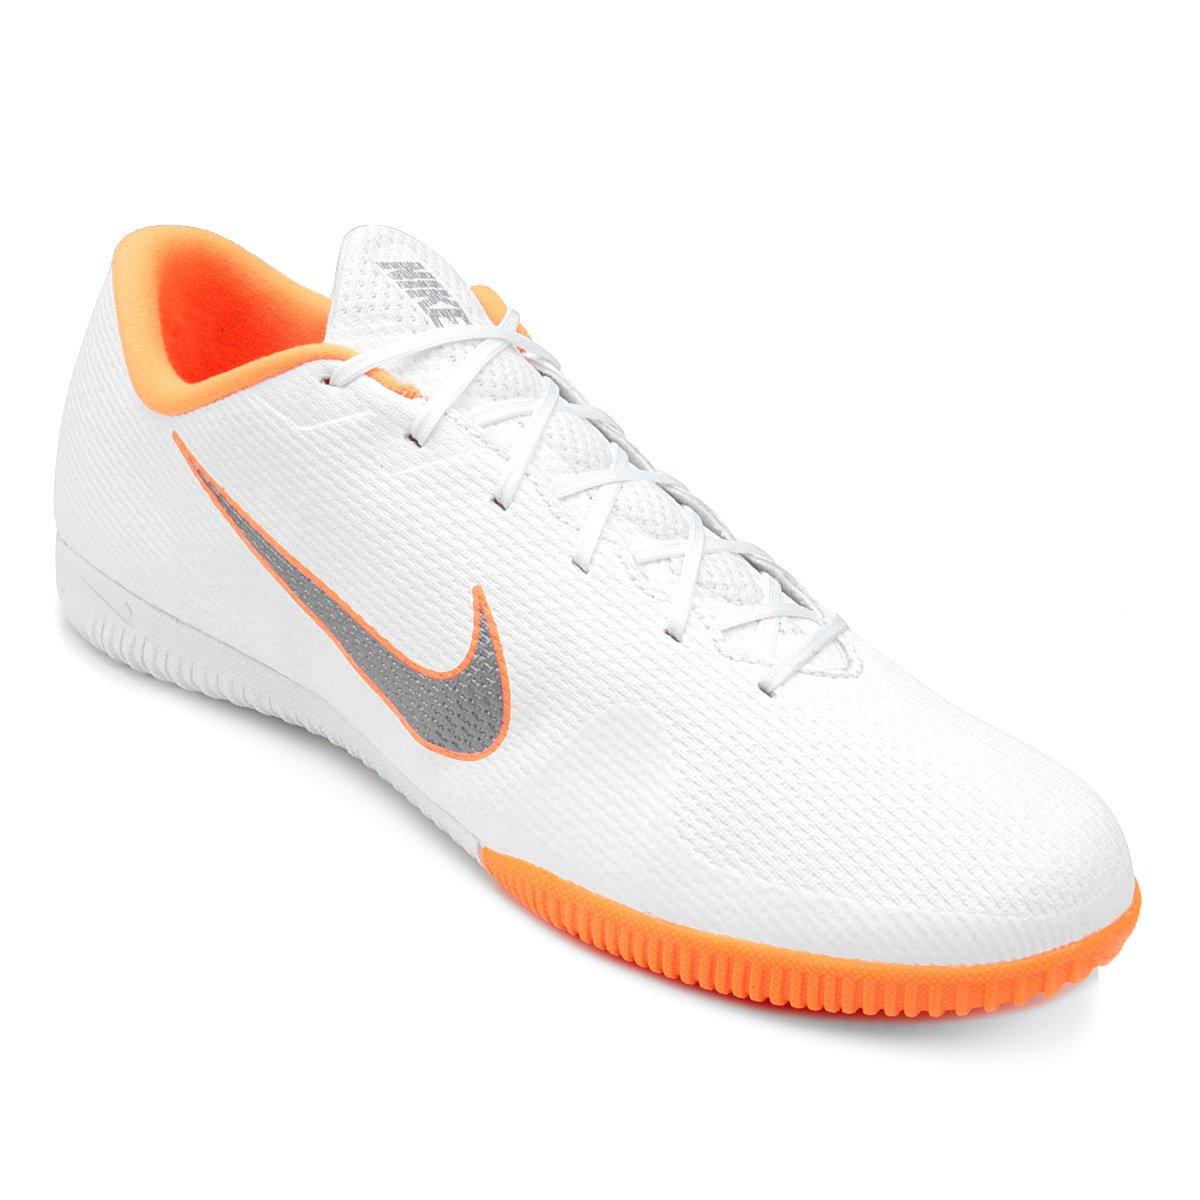 707e4aae87 ... where to buy chuteira futsal nike mercurial vapor 12 academy masculina  17aa8 47f51